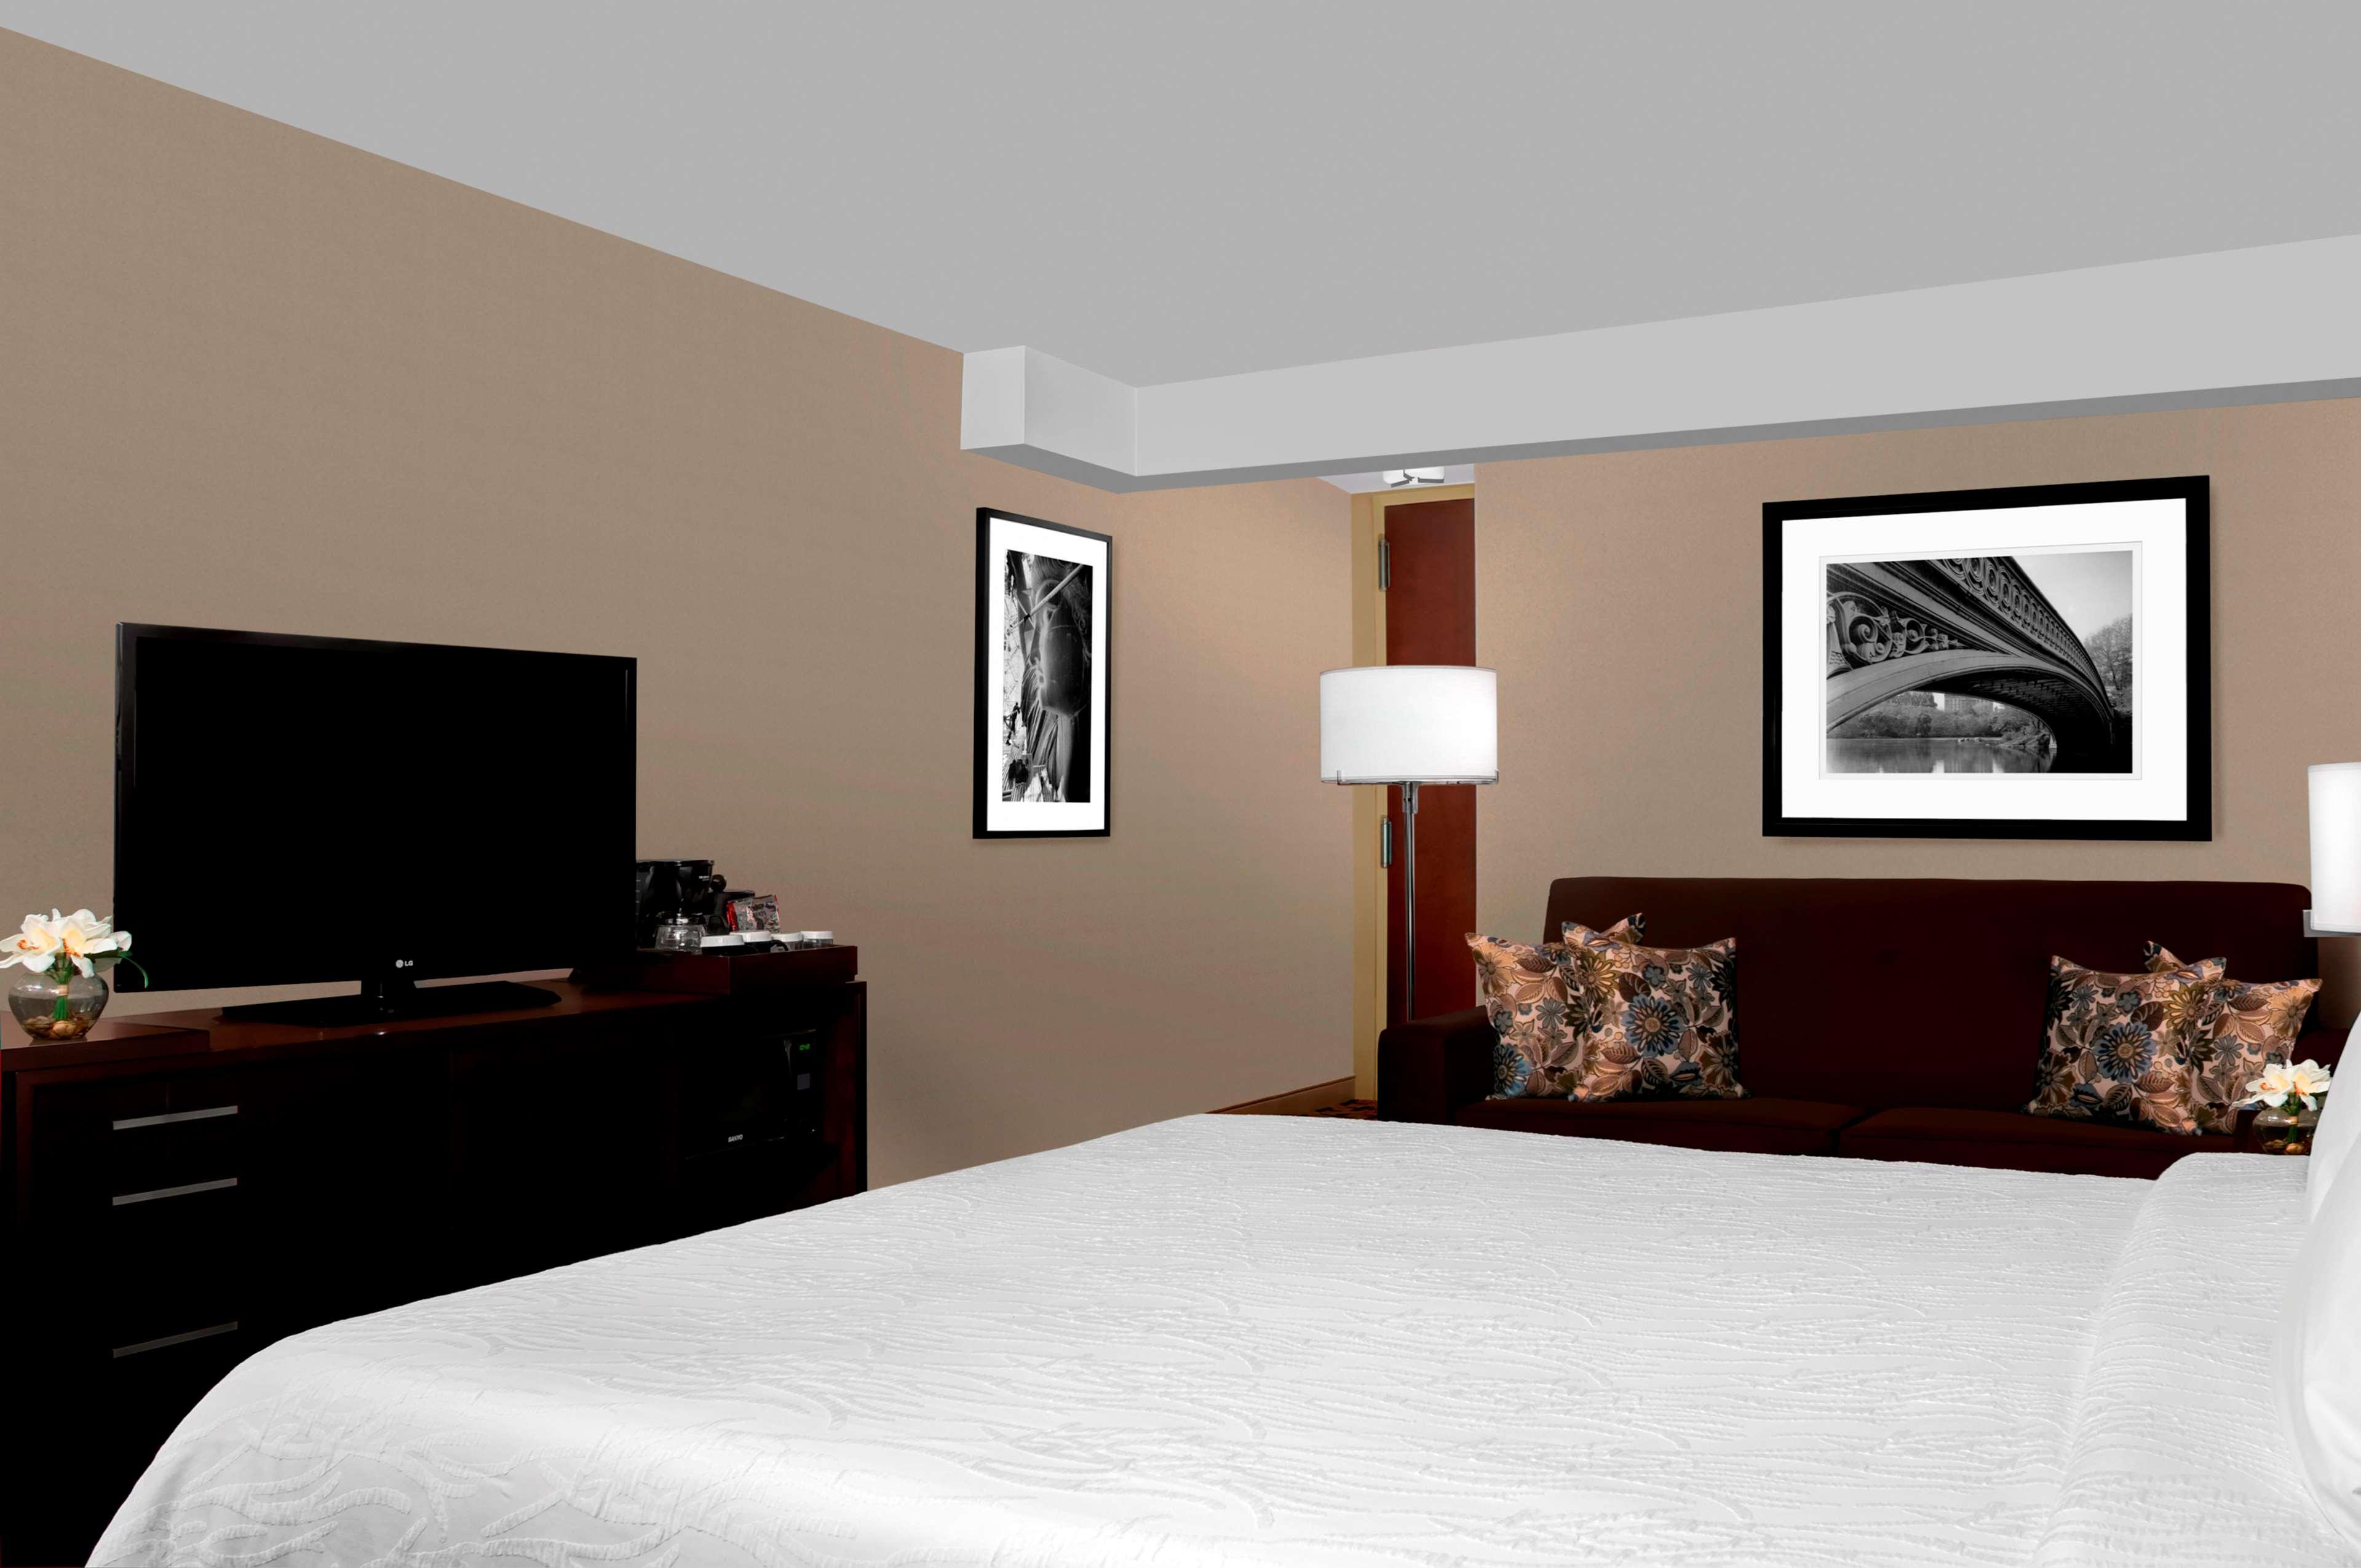 Hilton Garden Inn Times Square image 13